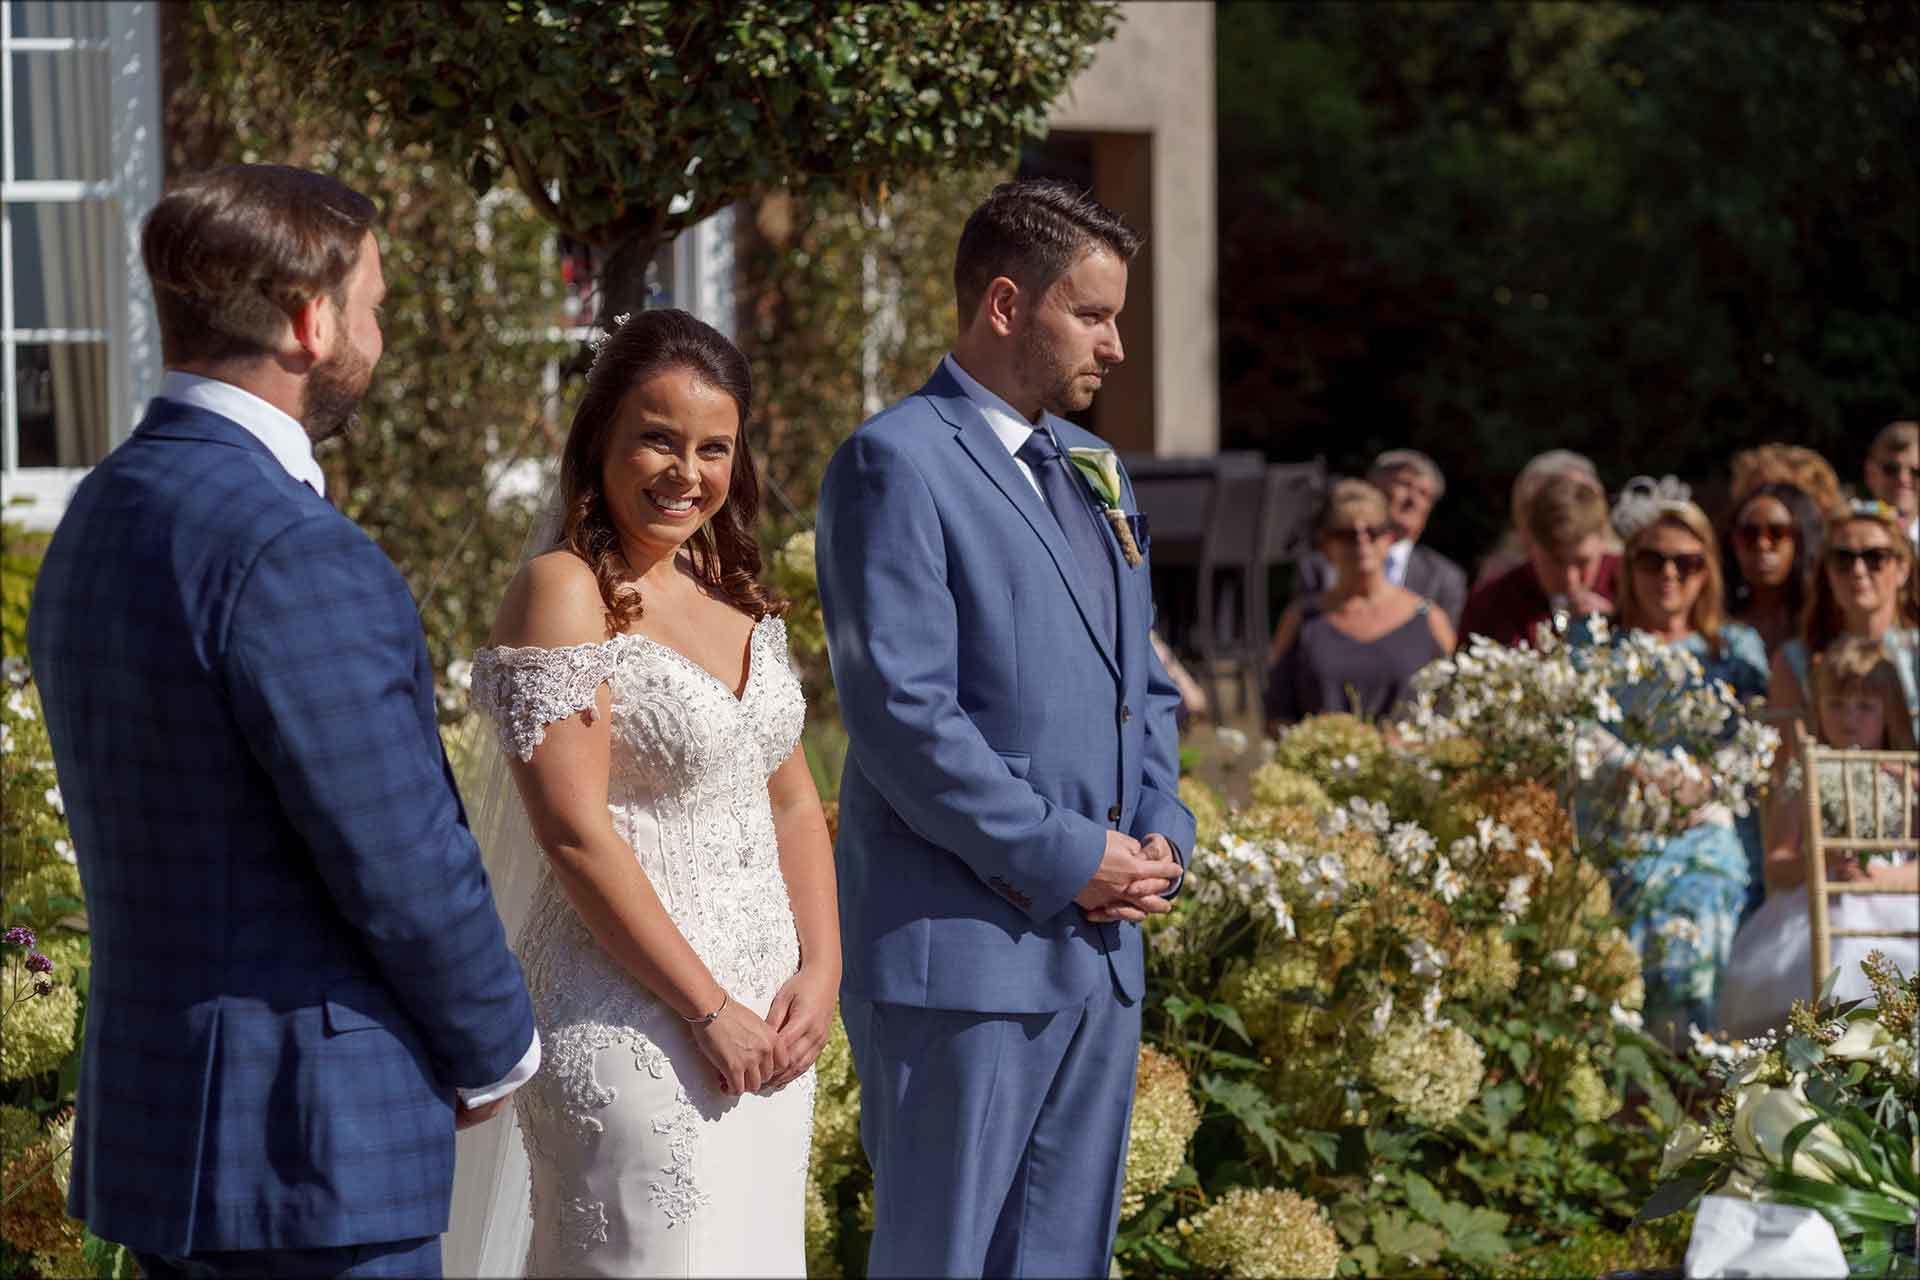 Smiling bride, sunny outdoor ceremony